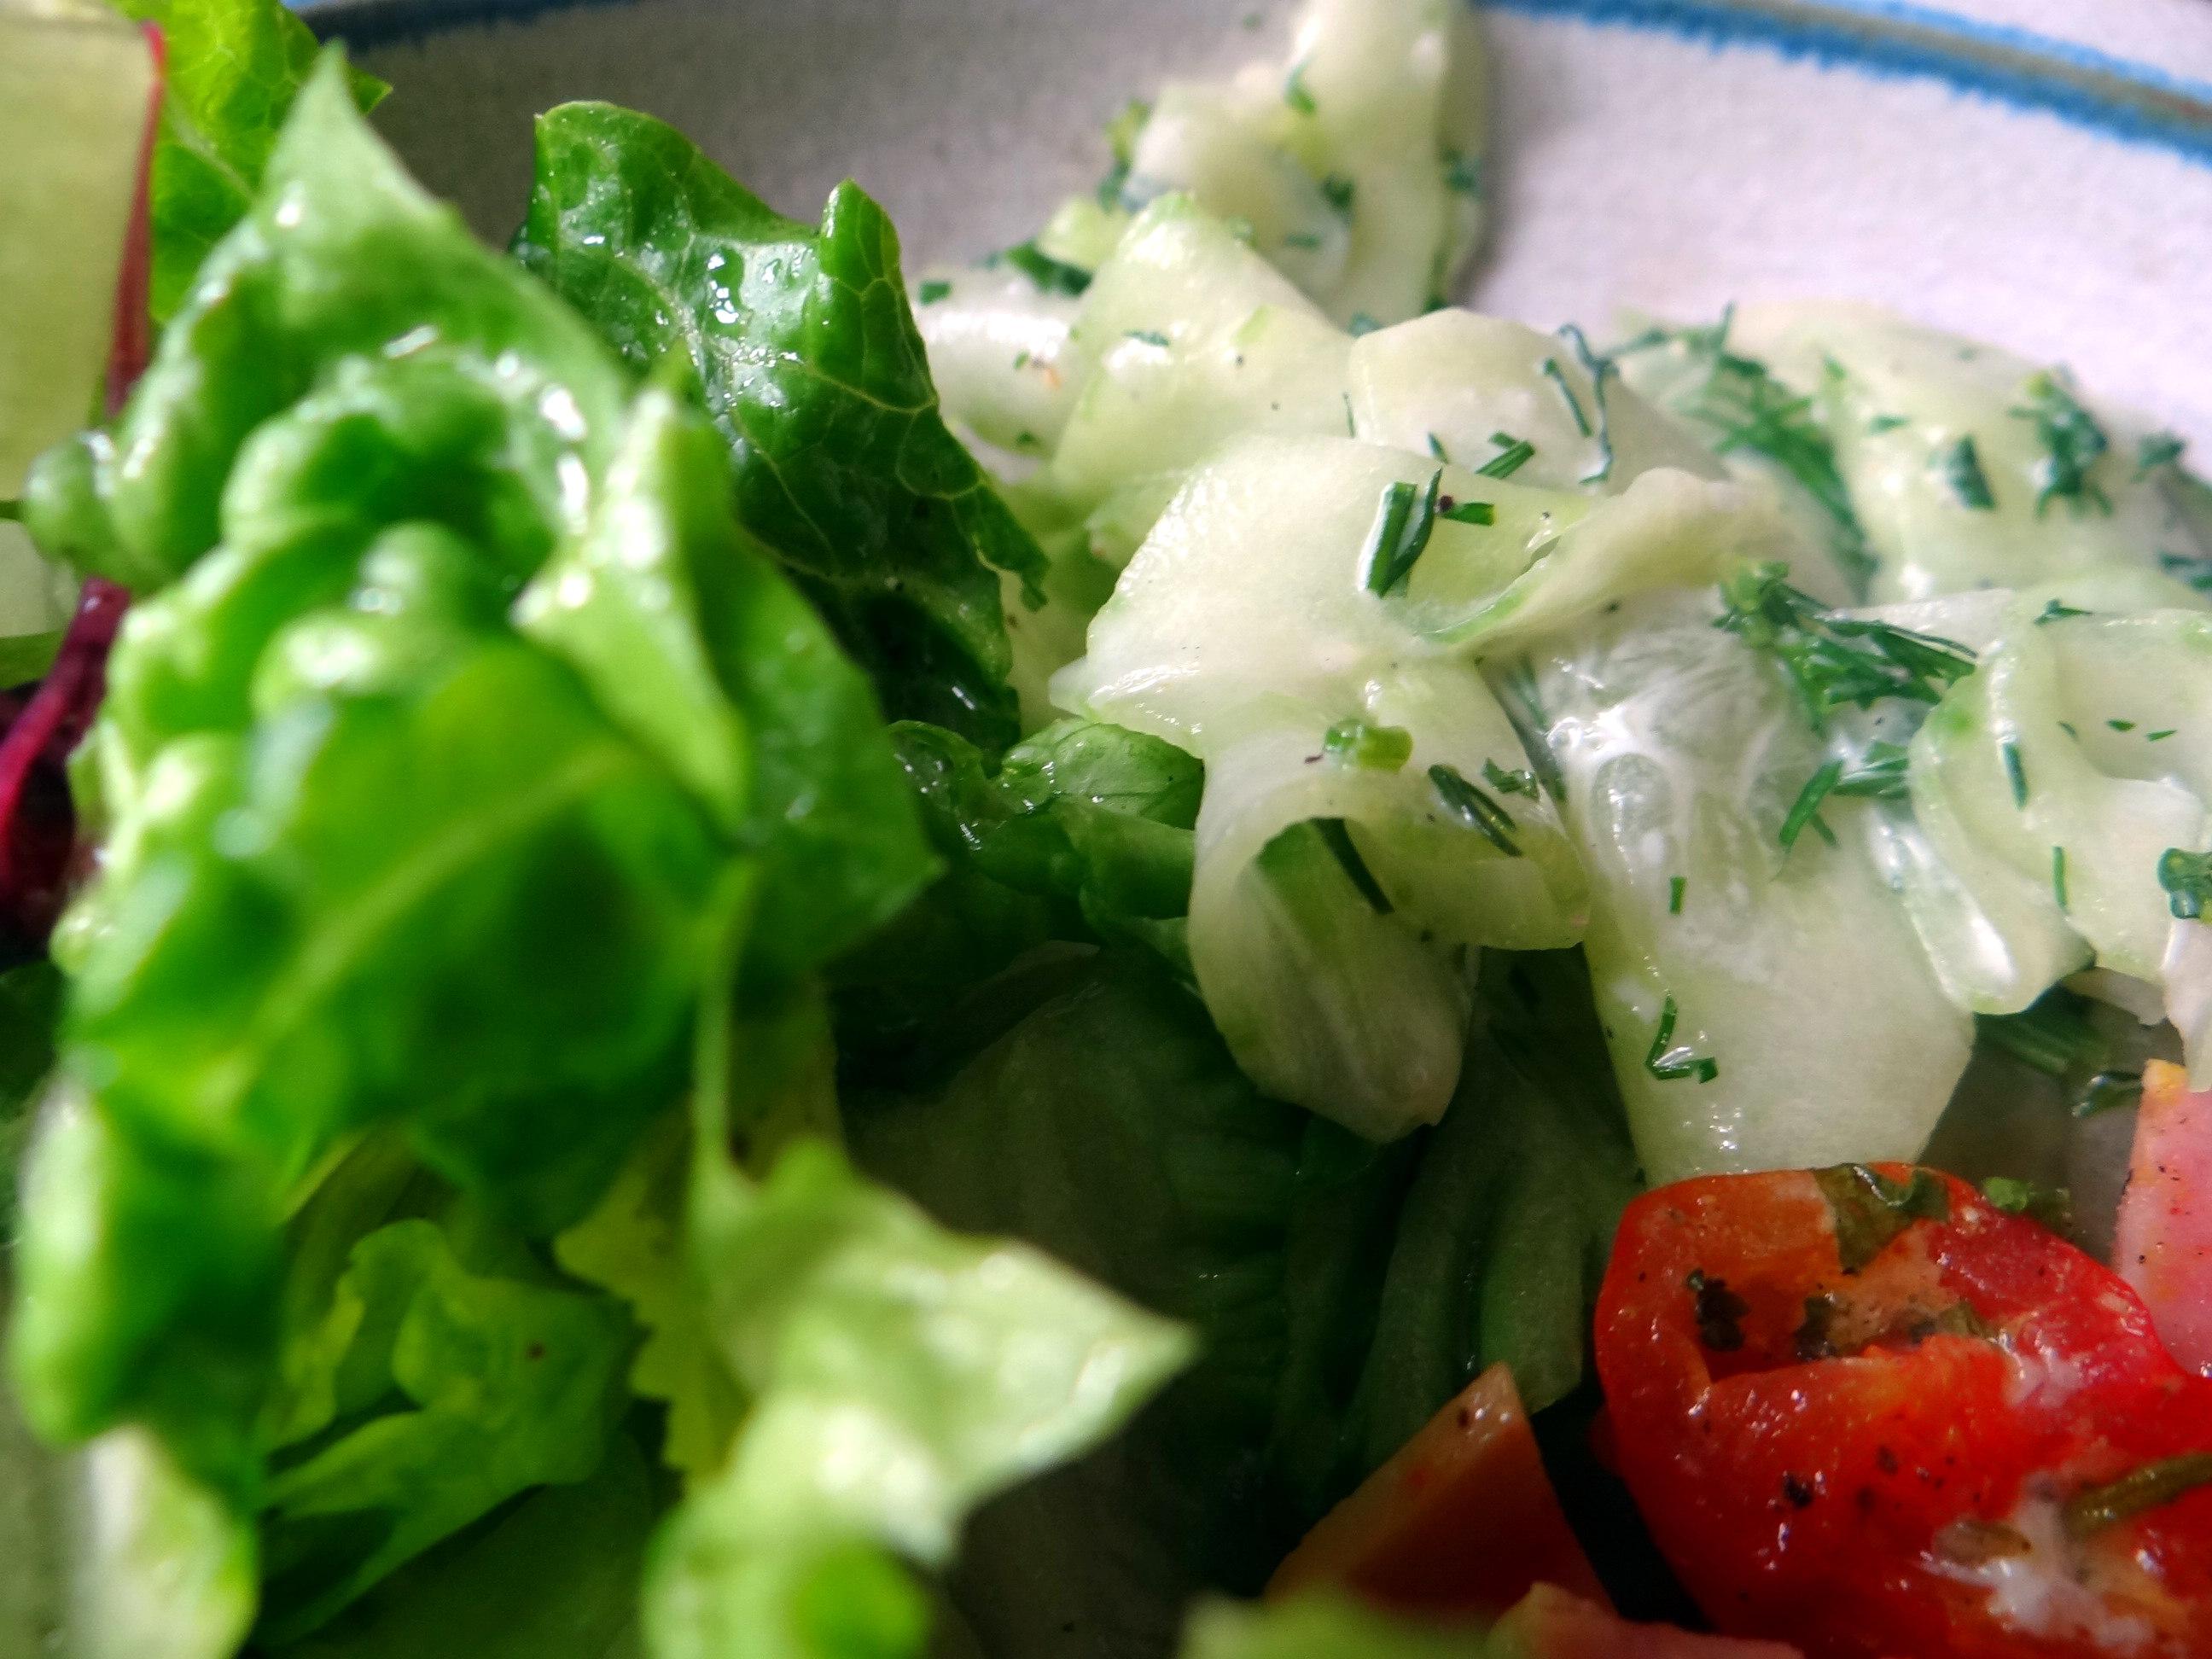 Resteessen,Gurkensalat,Romasalat (12)